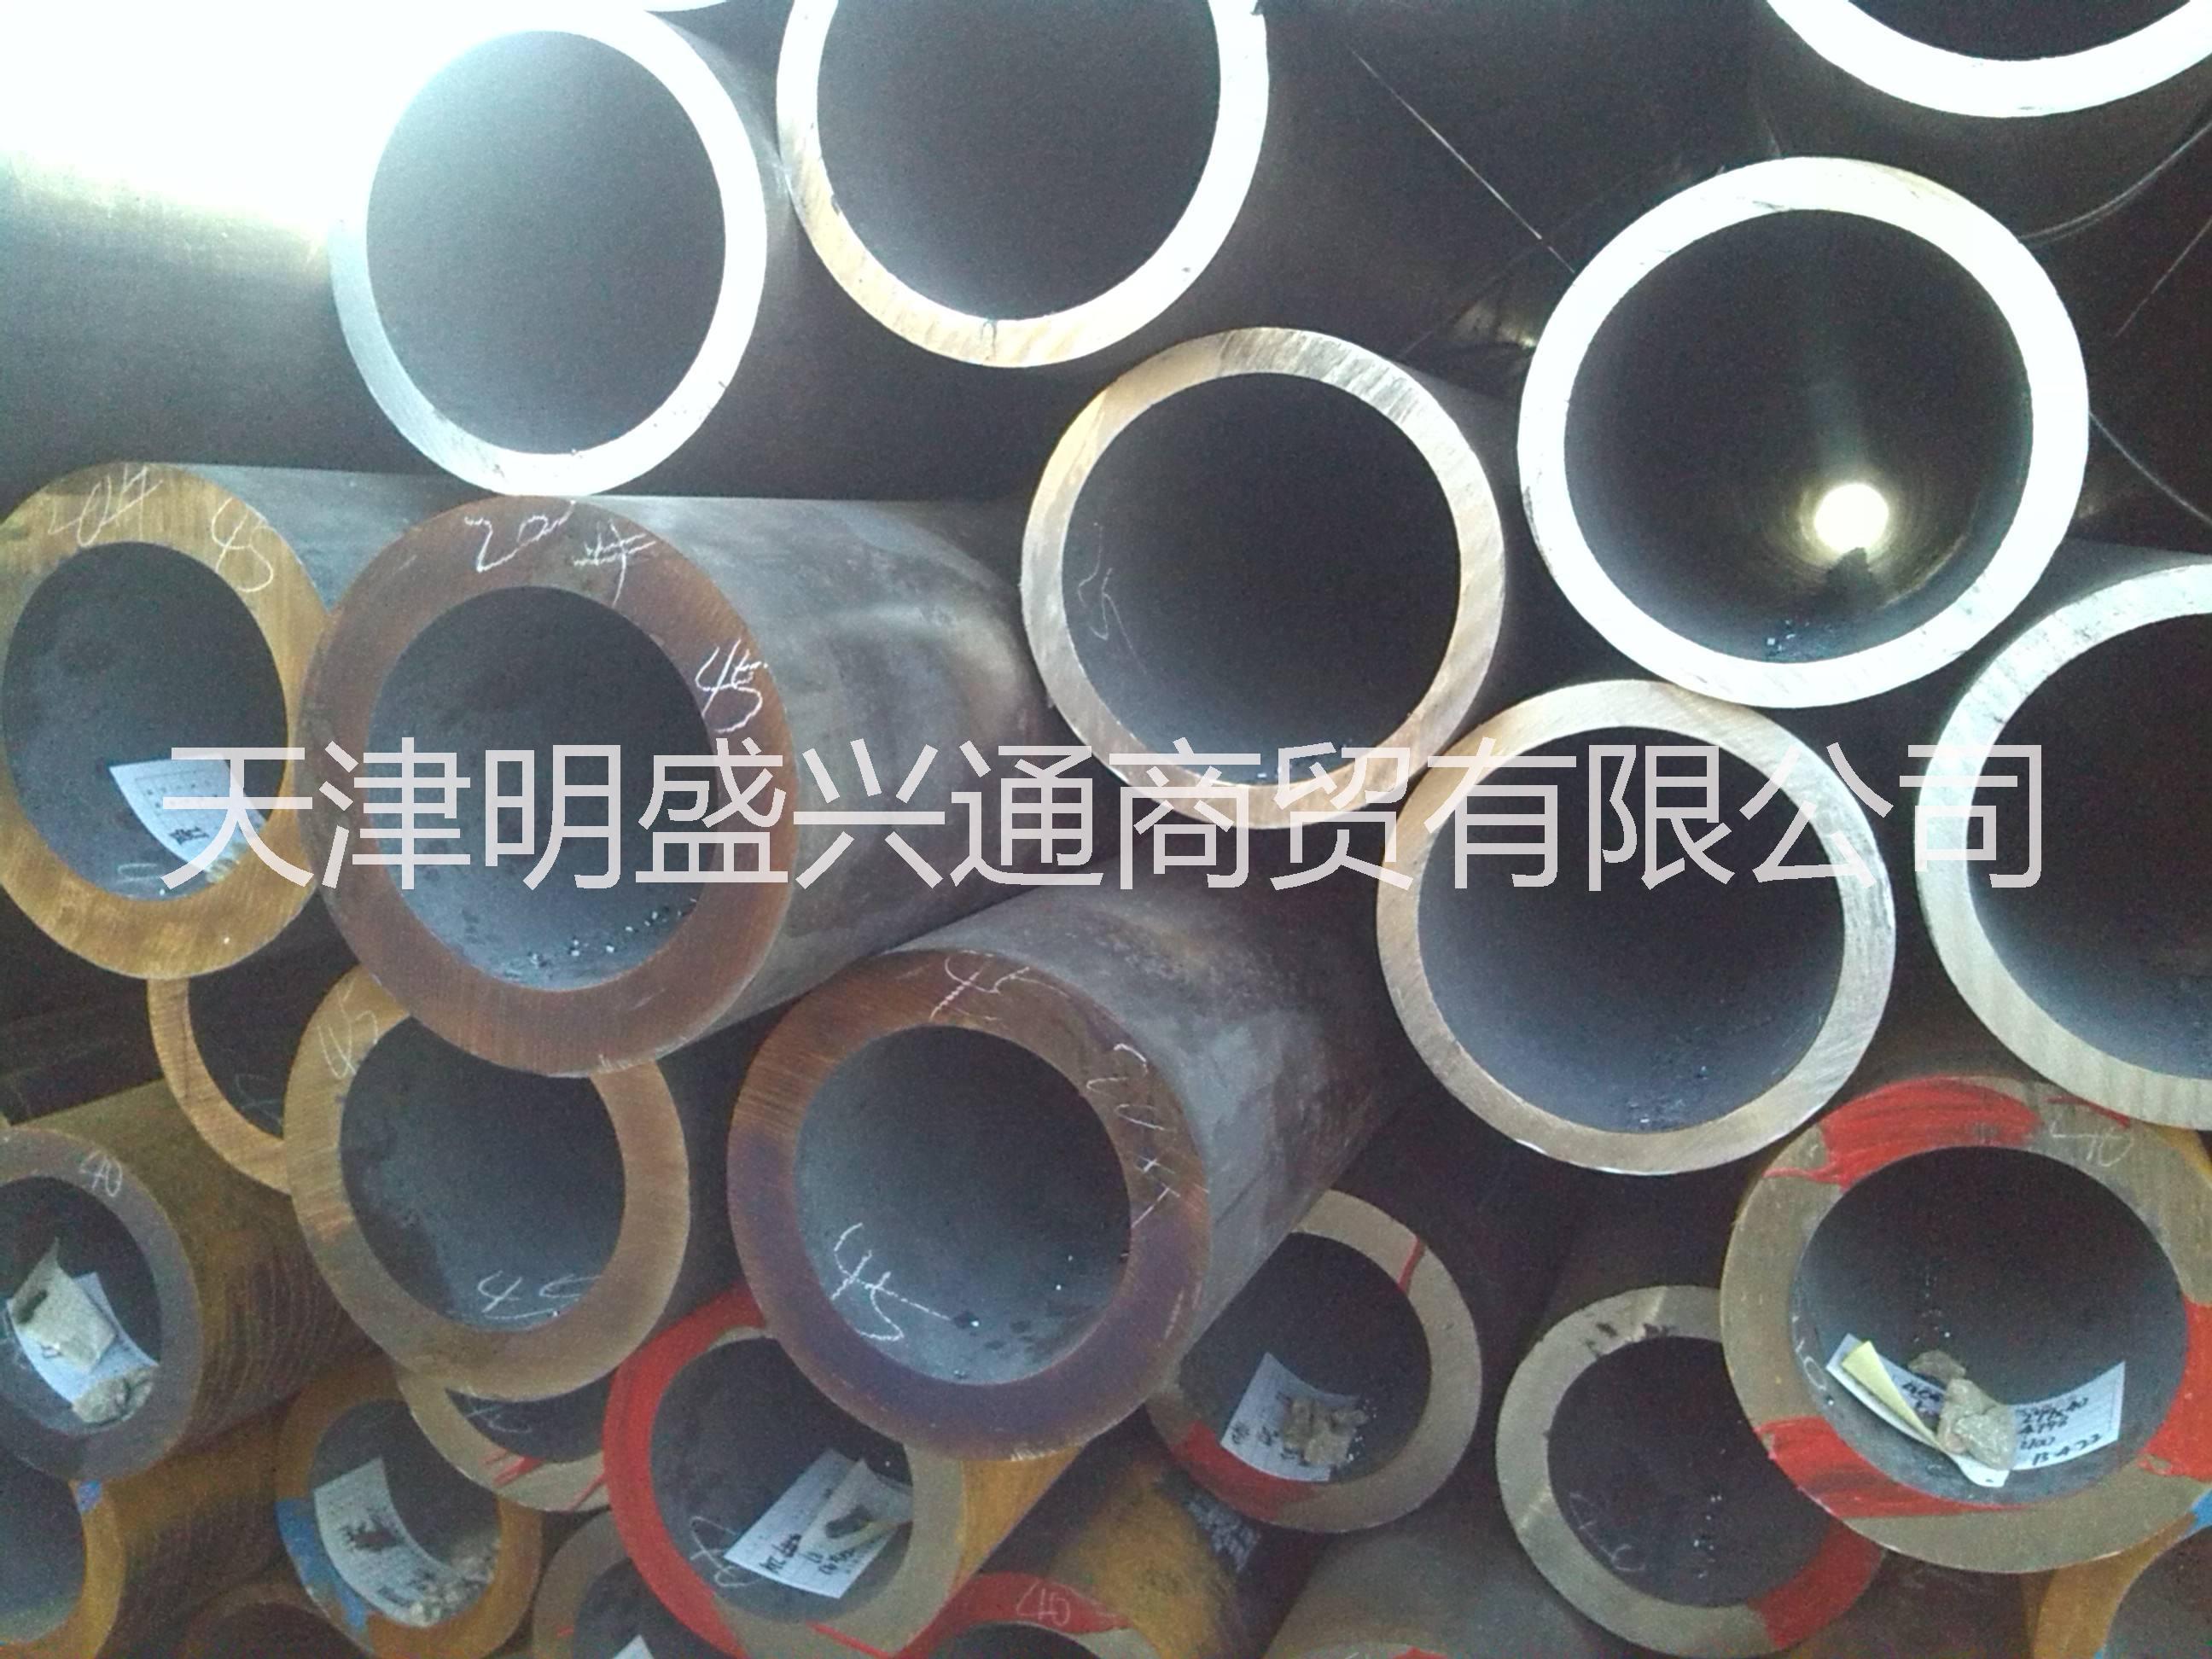 P22合金管  本厂常年经营P22合金管 T91合金管